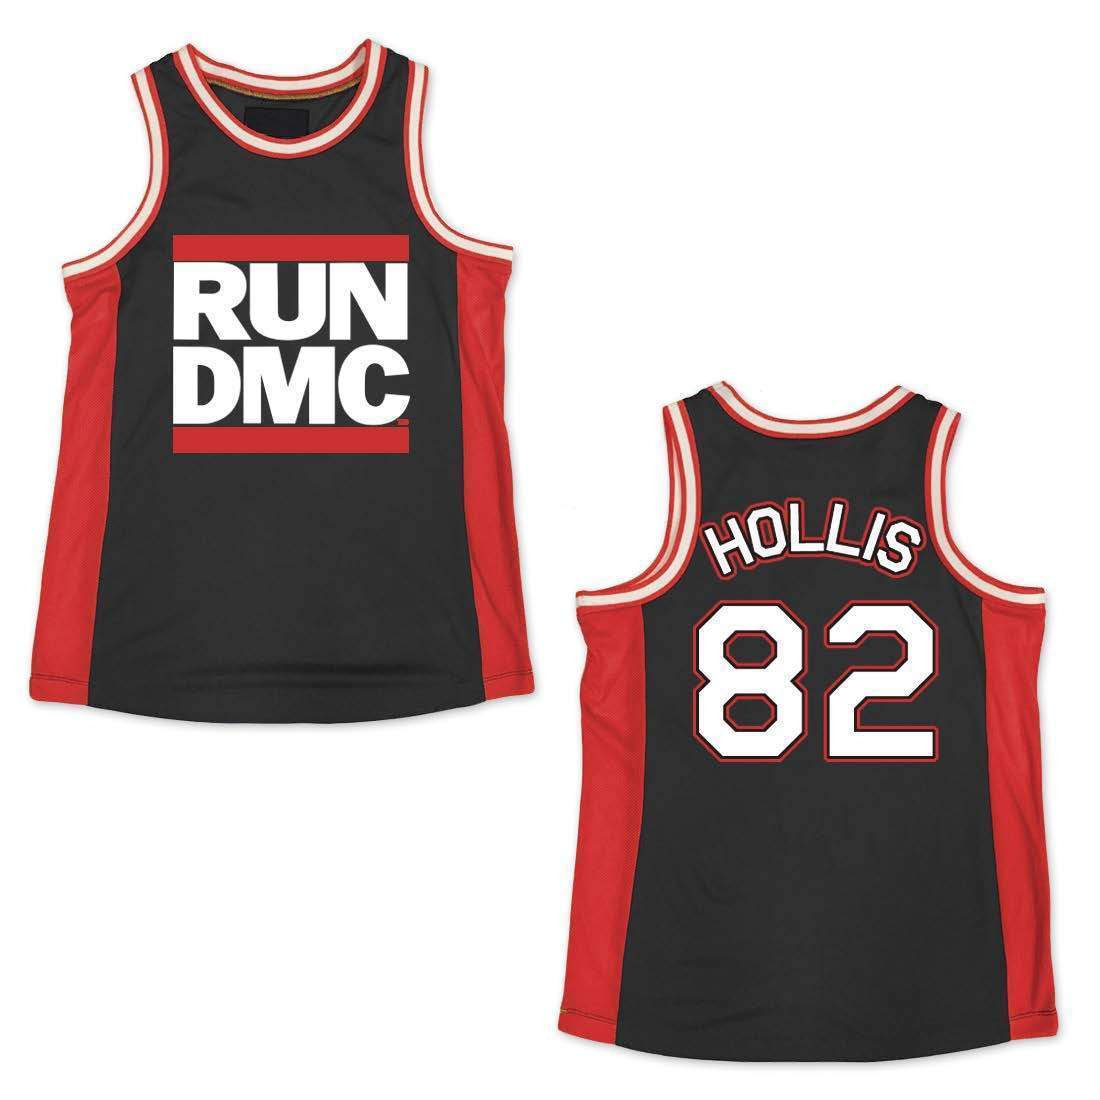 watch 46f32 e1952 Run dmc black/red basketball jersey, Run dmc, basketball jersey, Run dmc  jersey, Run dmc basketball, vintage basketball, vintage jersey sold by  LMFAO ...